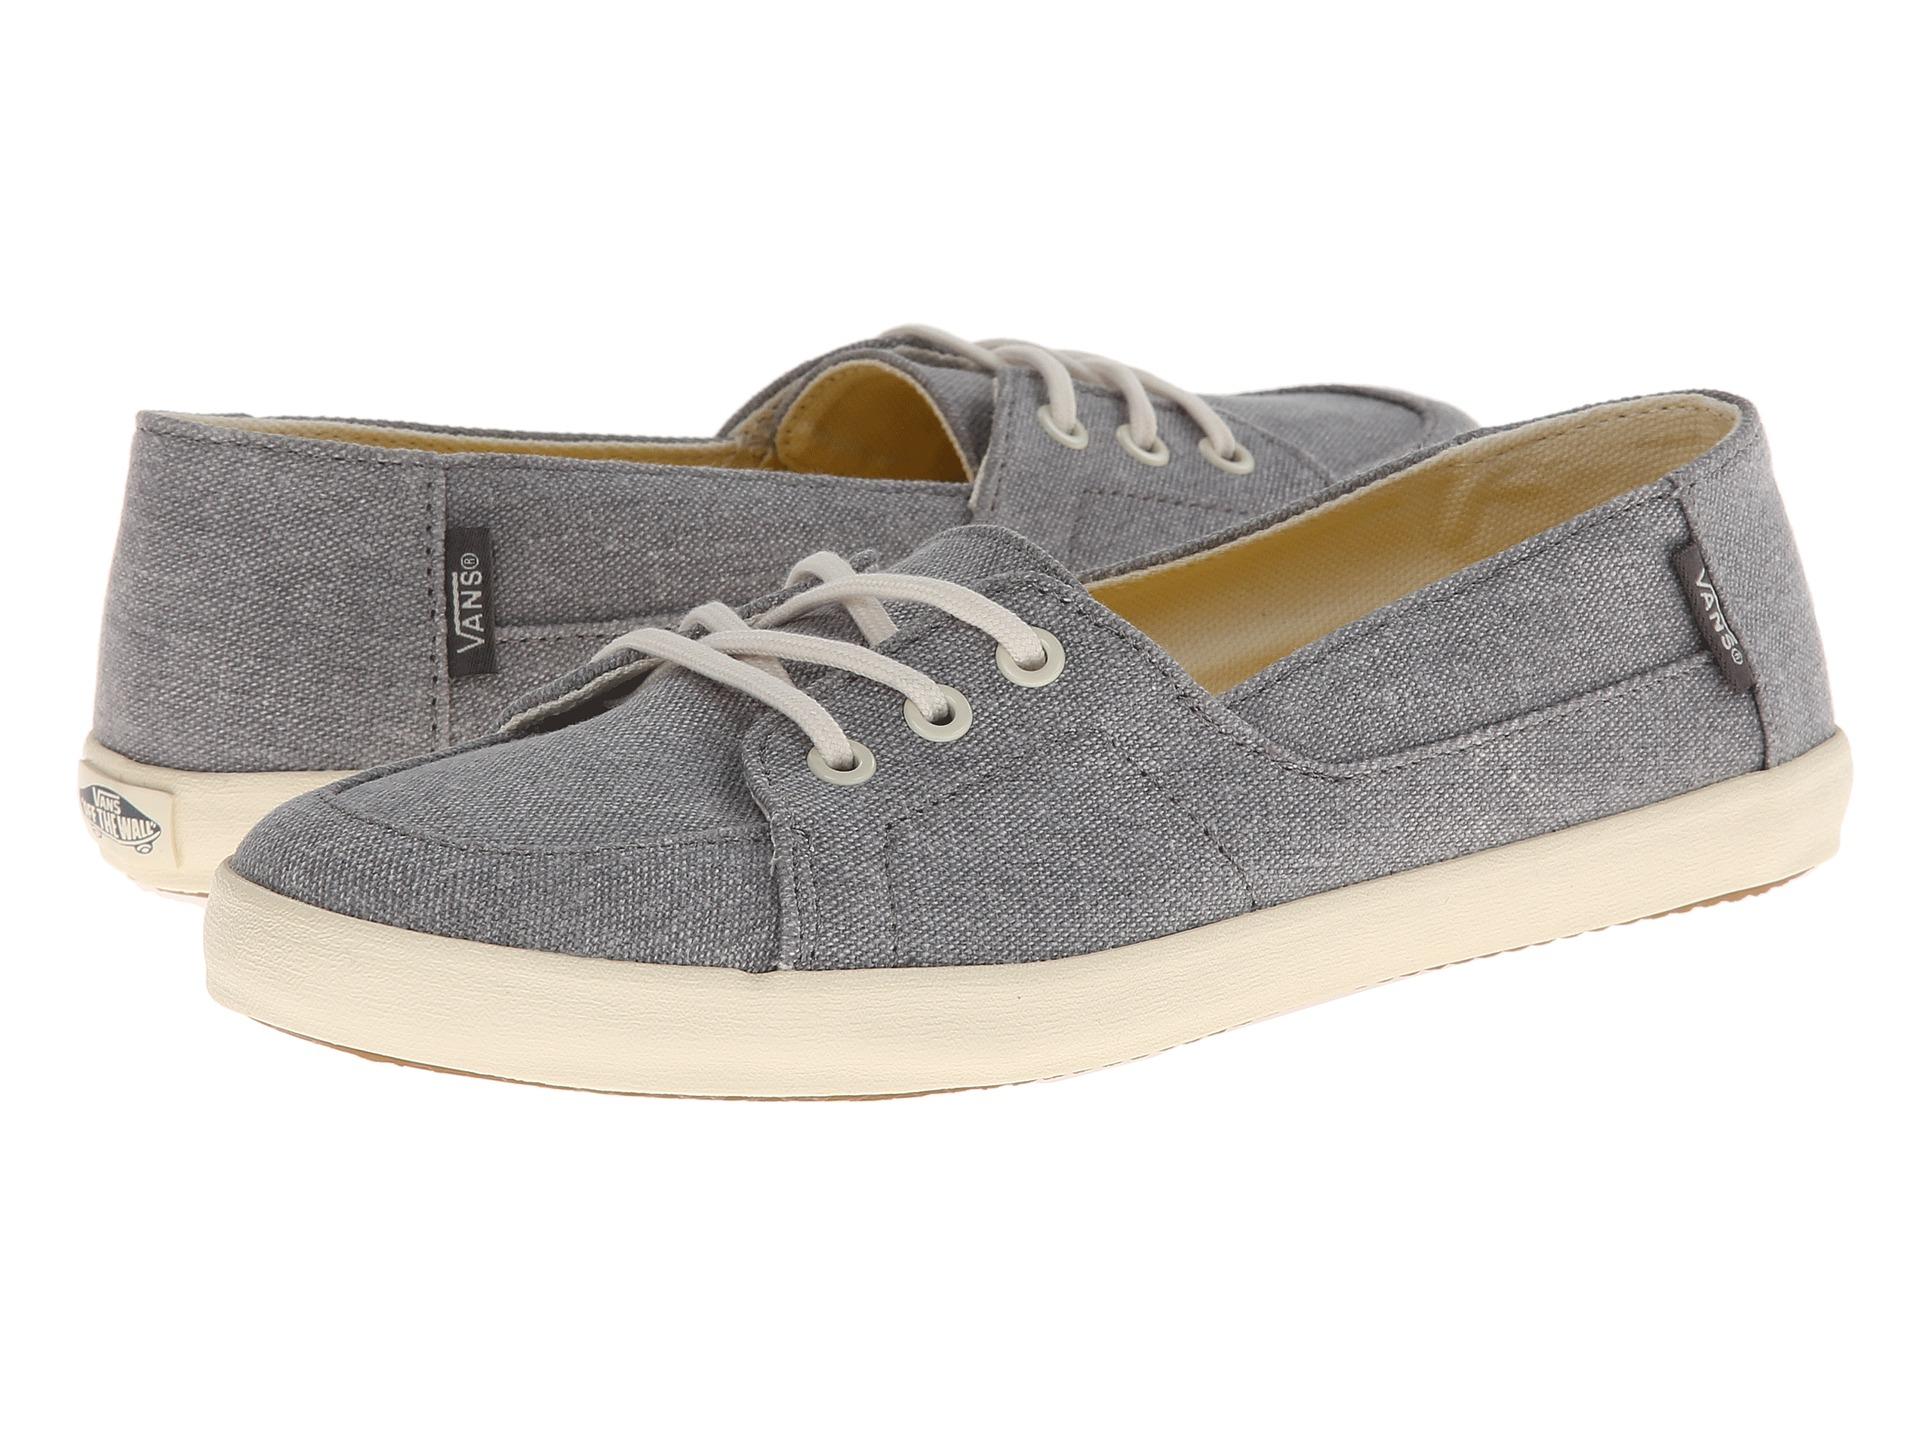 162de15564ac90 Lyst - Vans Palisades Vulc W in Gray